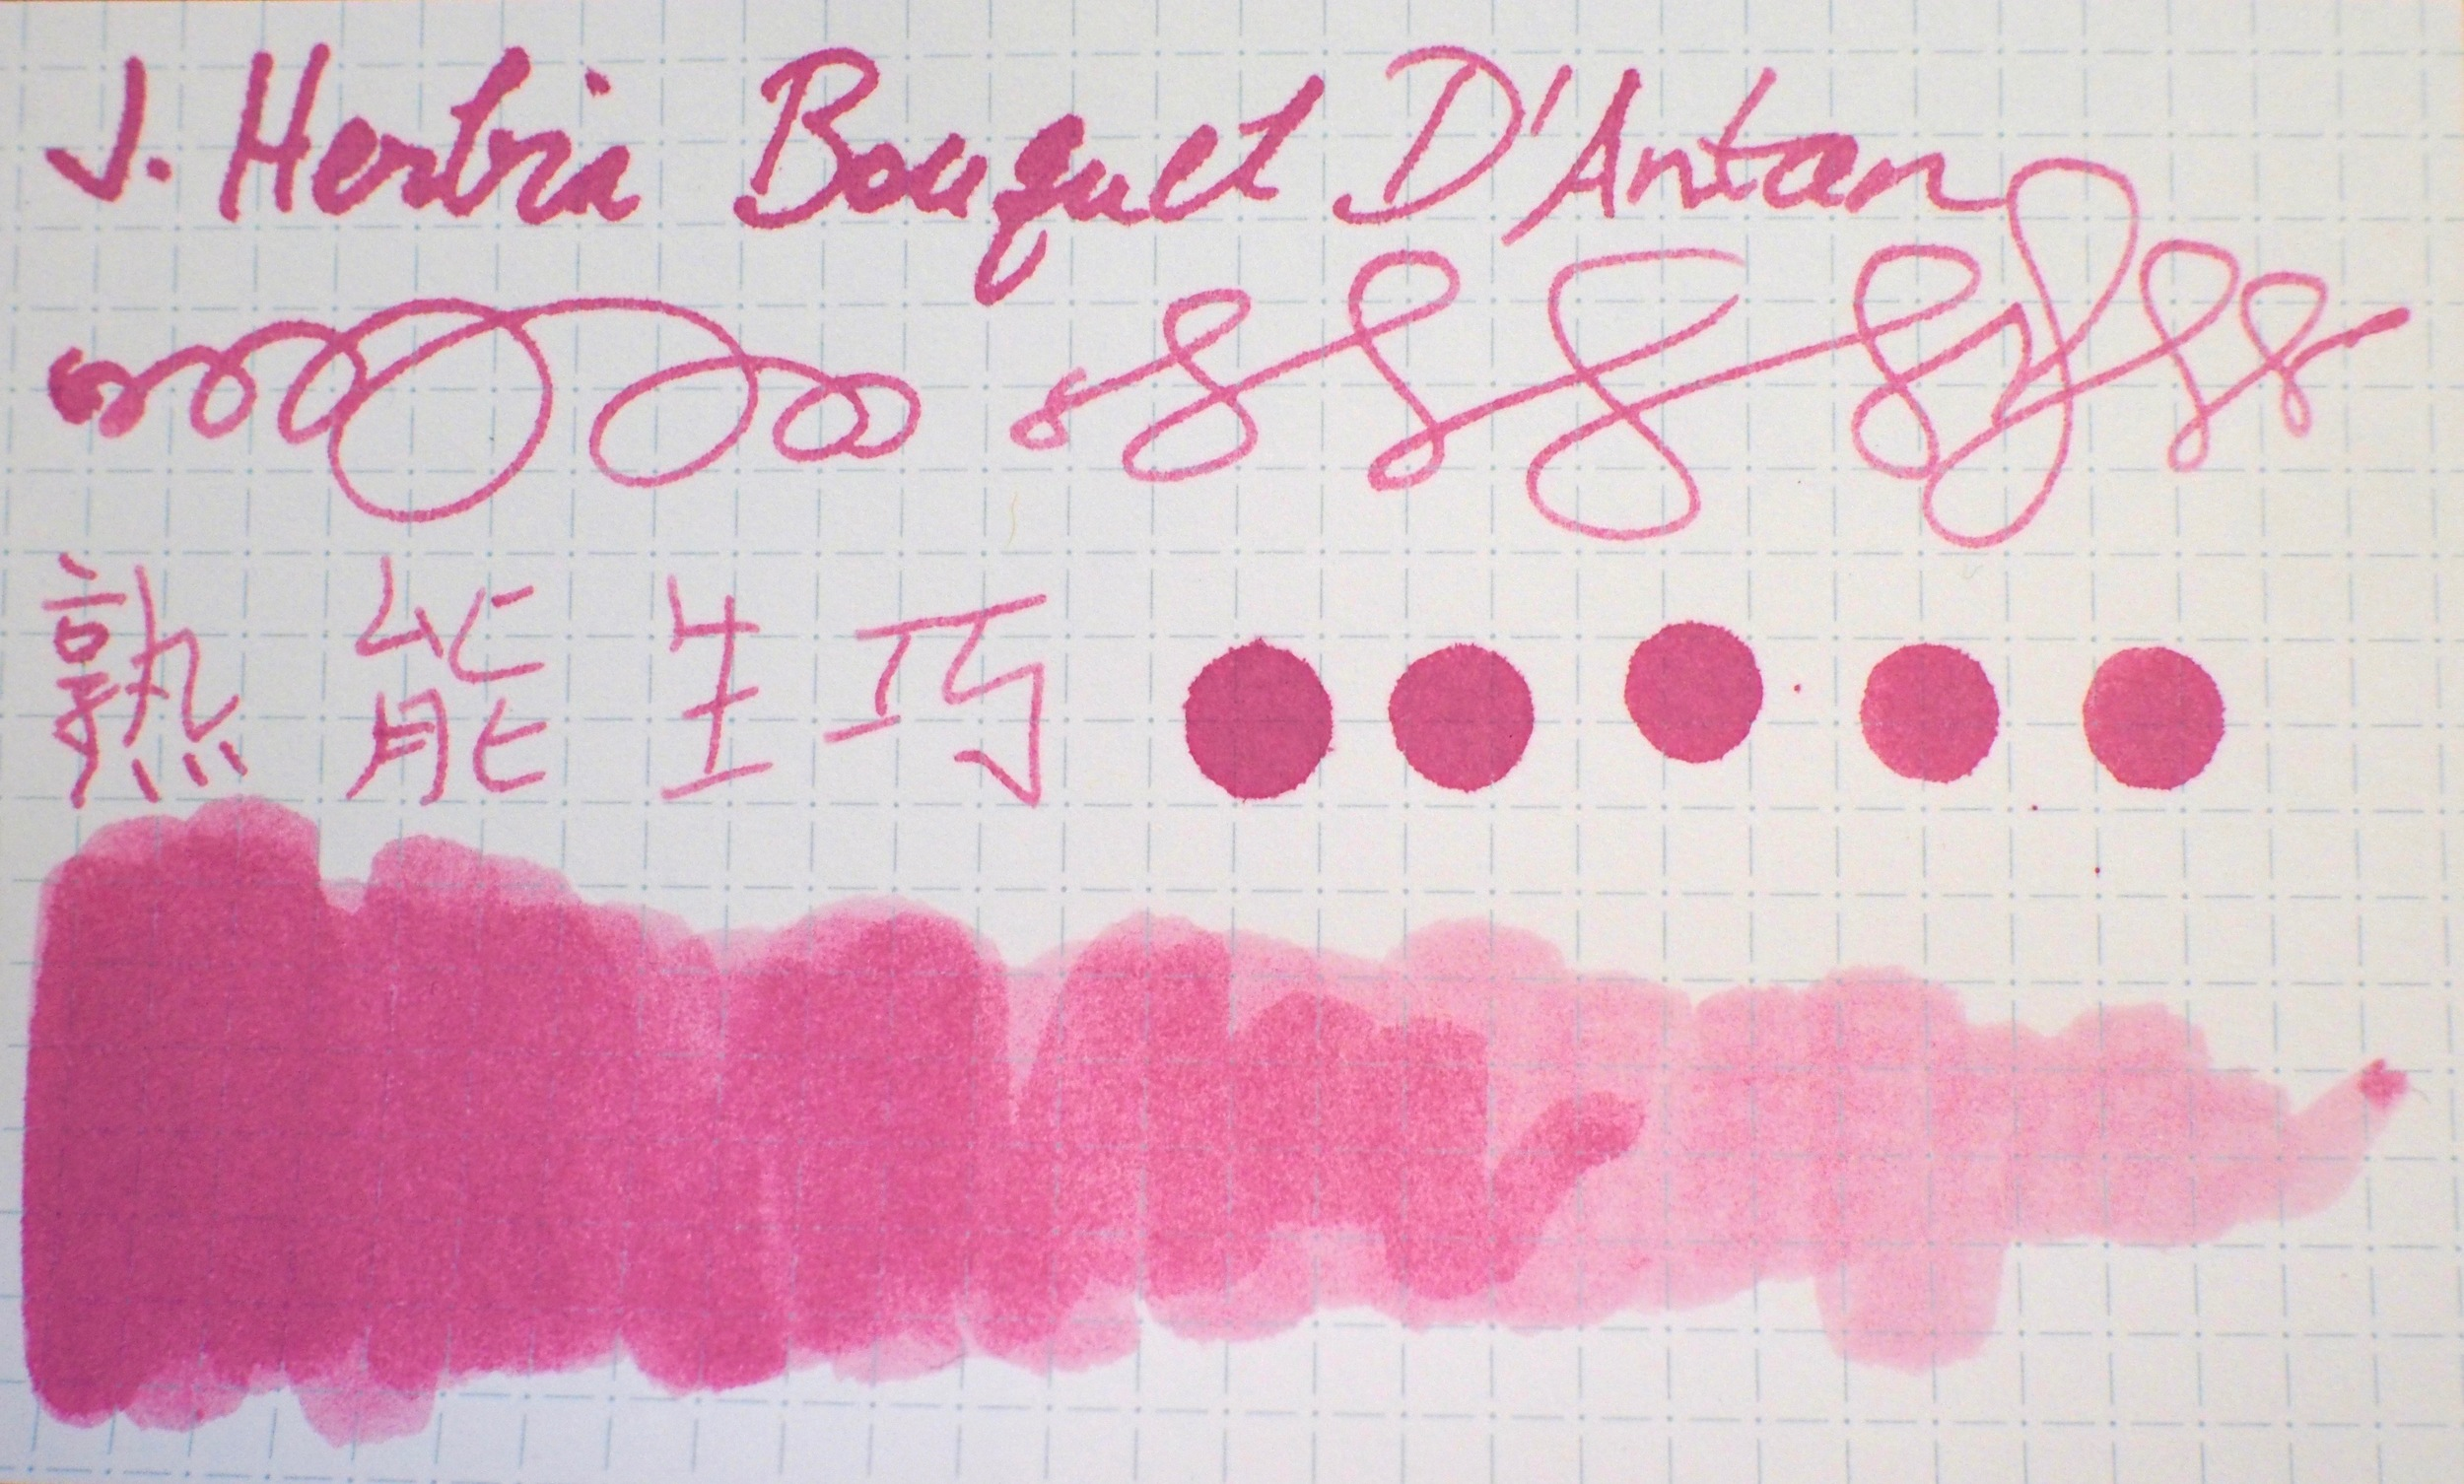 Bonus Pic: J. Herbin Bouquet D'Antan using Rohner & Klingner Glass Dip Pen and Cotton Swabs on Nock Co Dot Dash Notecard